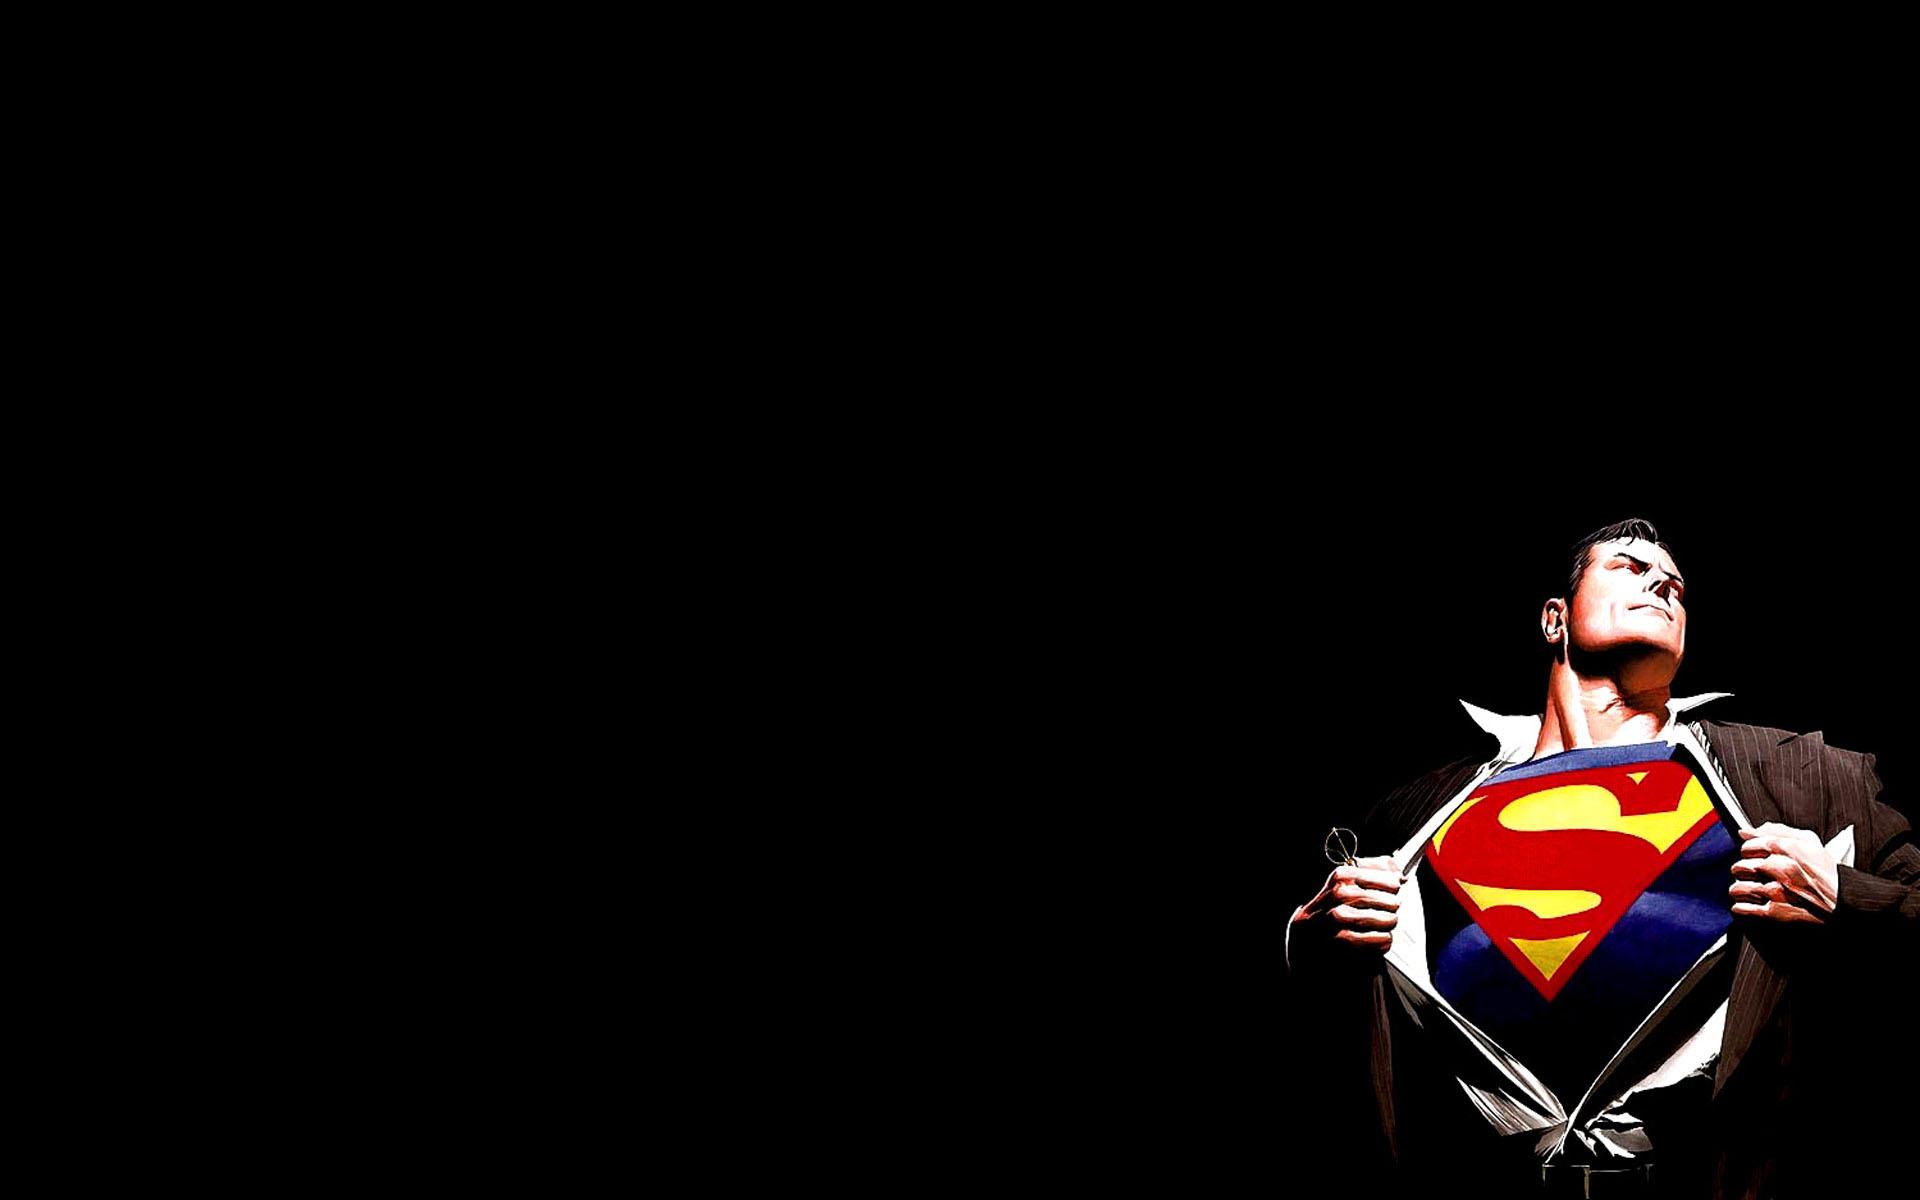 Superman Wallpaper Darthdookus Blog 1920x1200